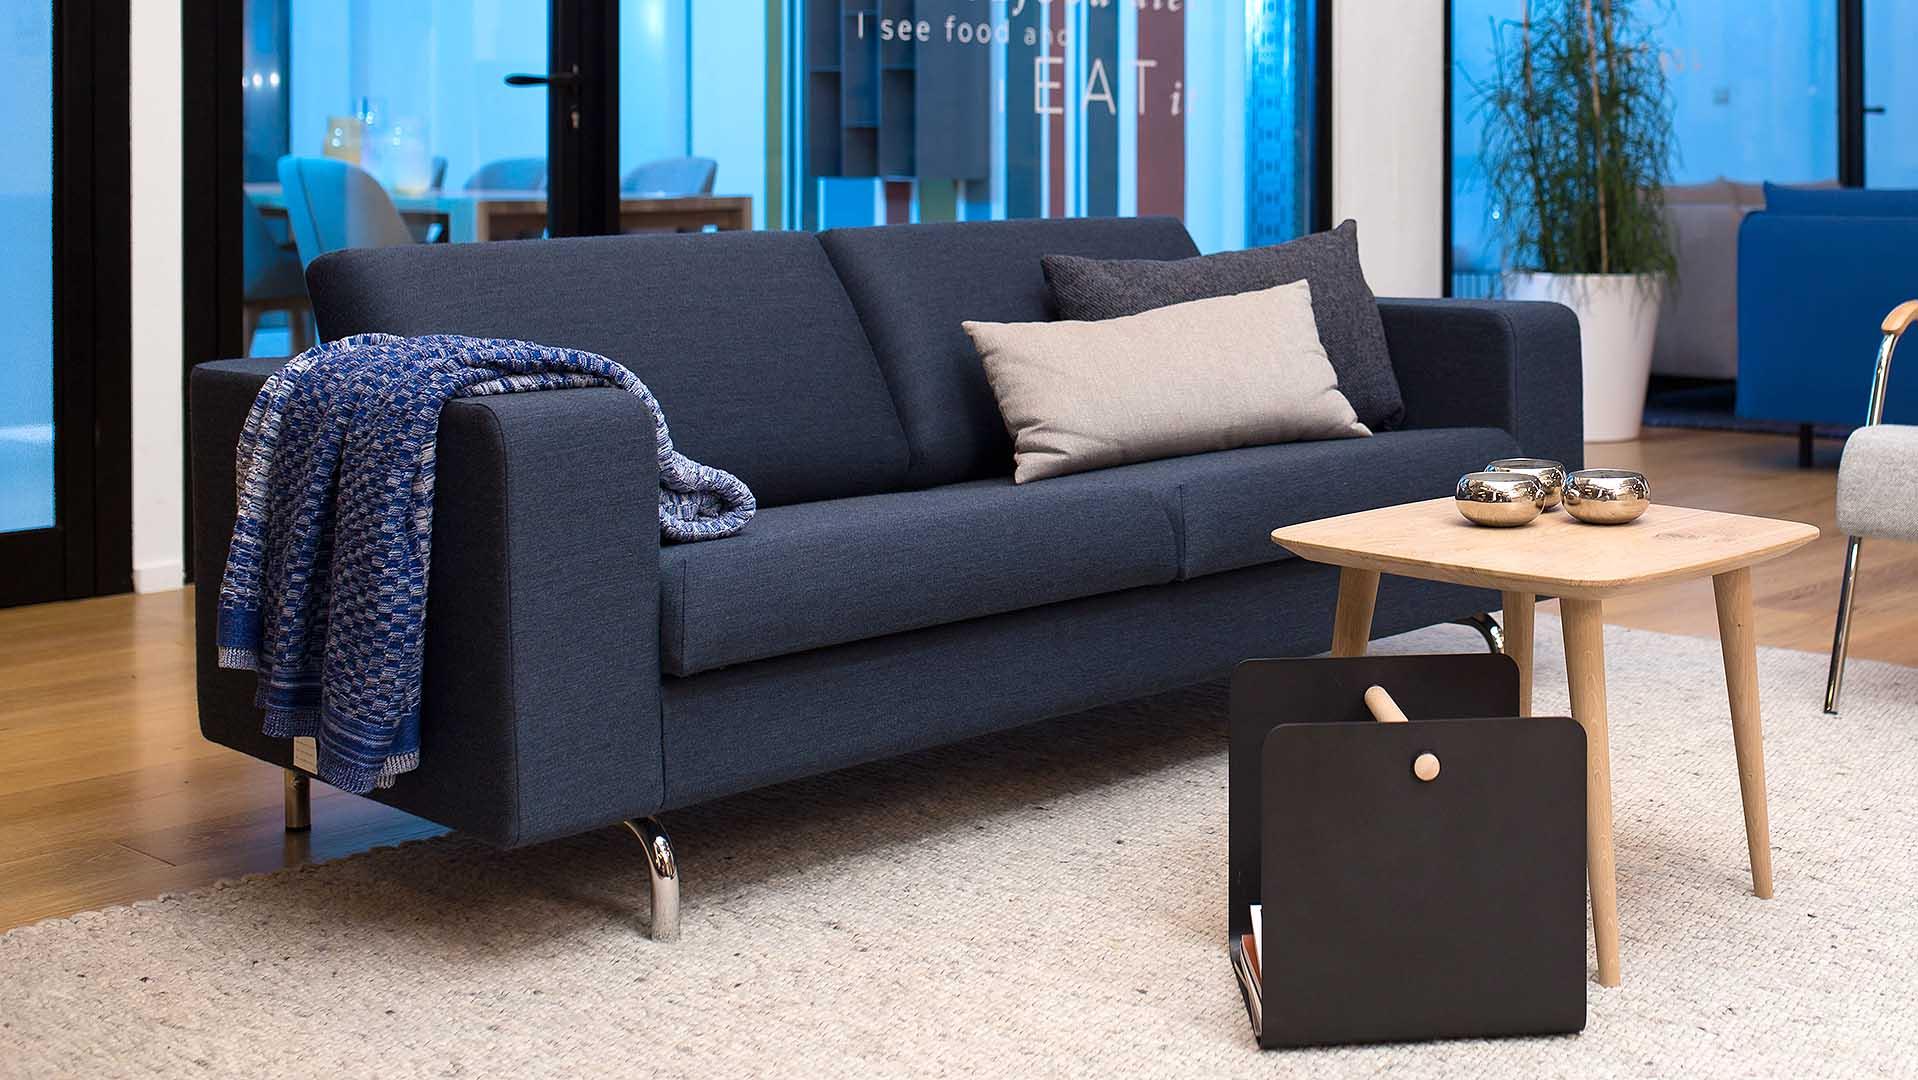 Exsta-146-Sofa-B125-DesignBy-SikkoValk-Lowres